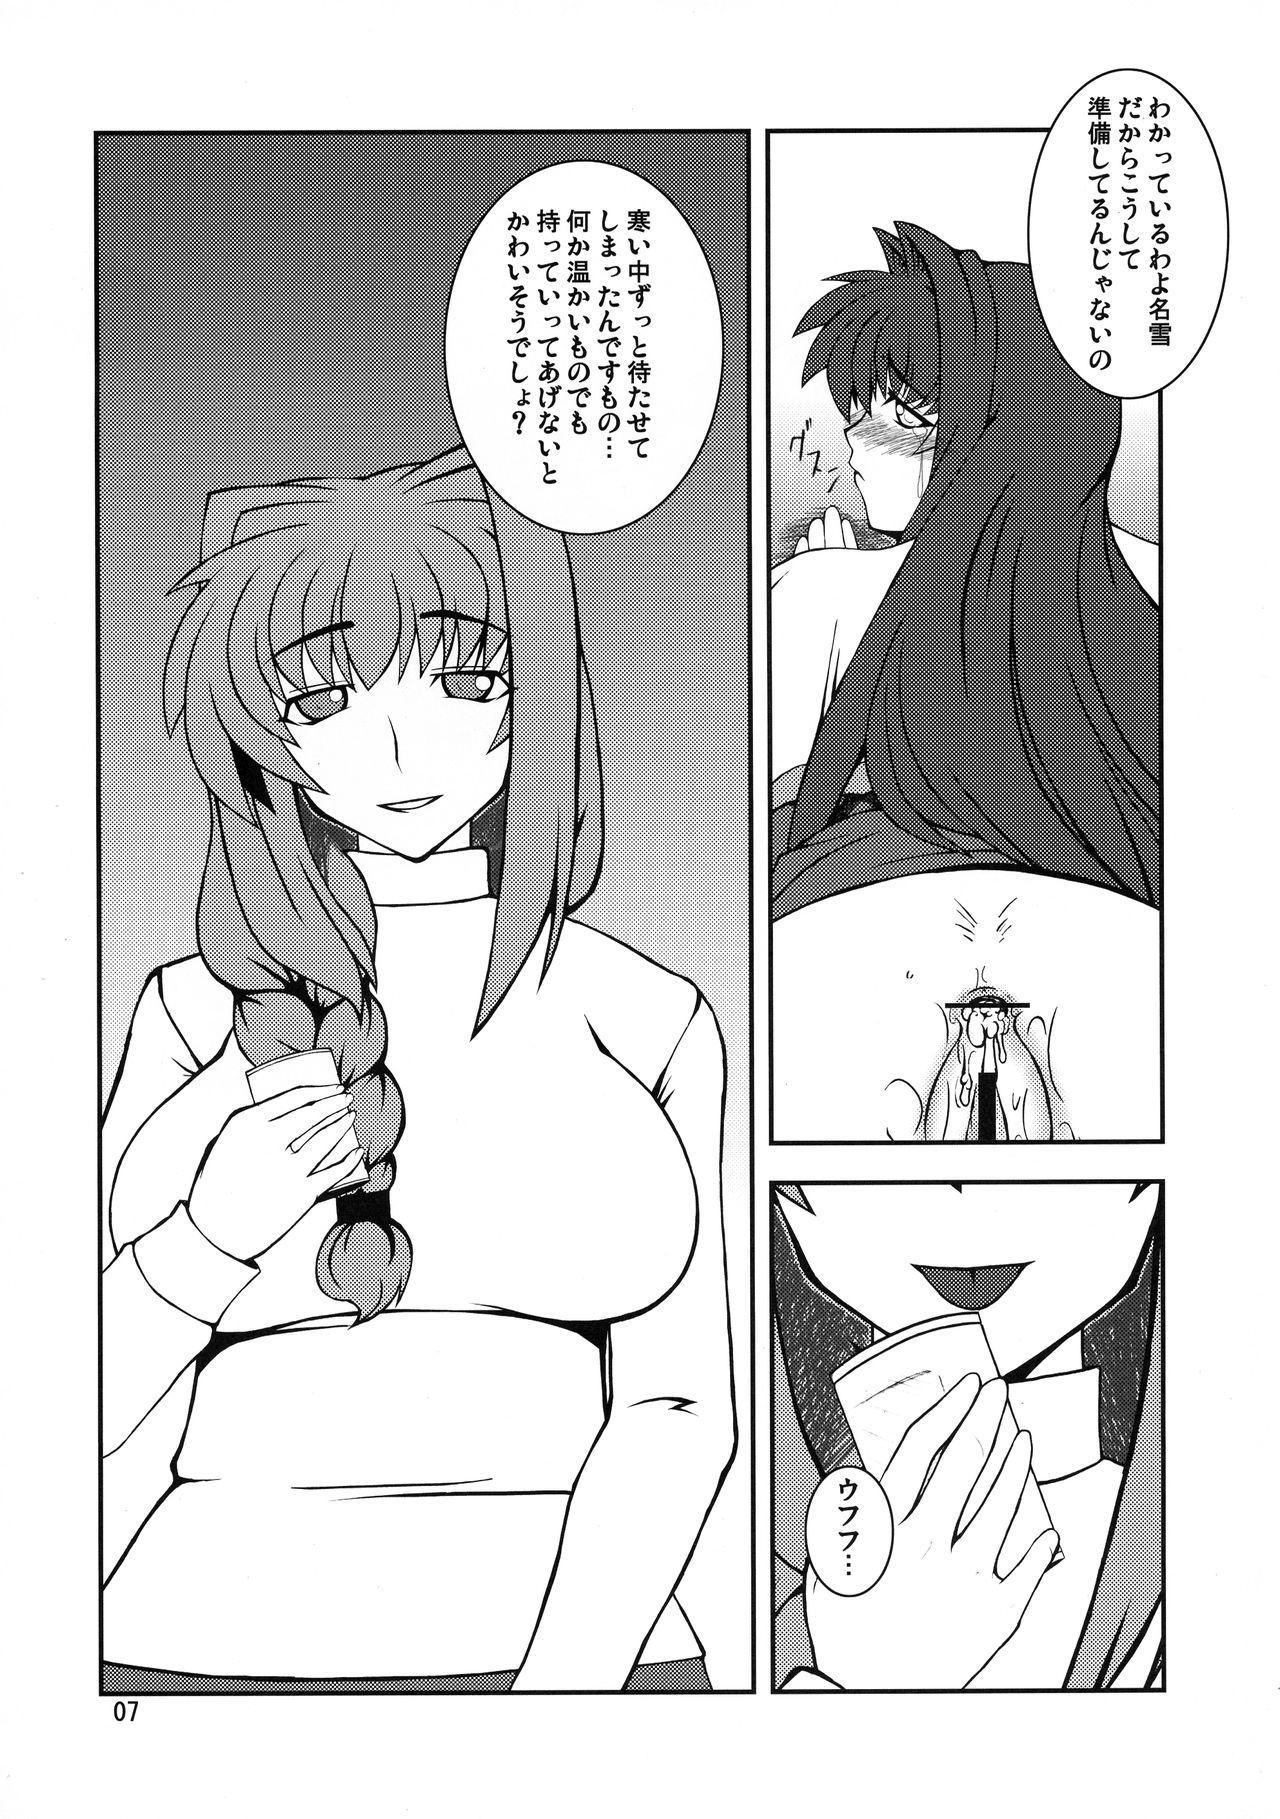 Kyouki Vol. 3~5 Remake Ver. 6